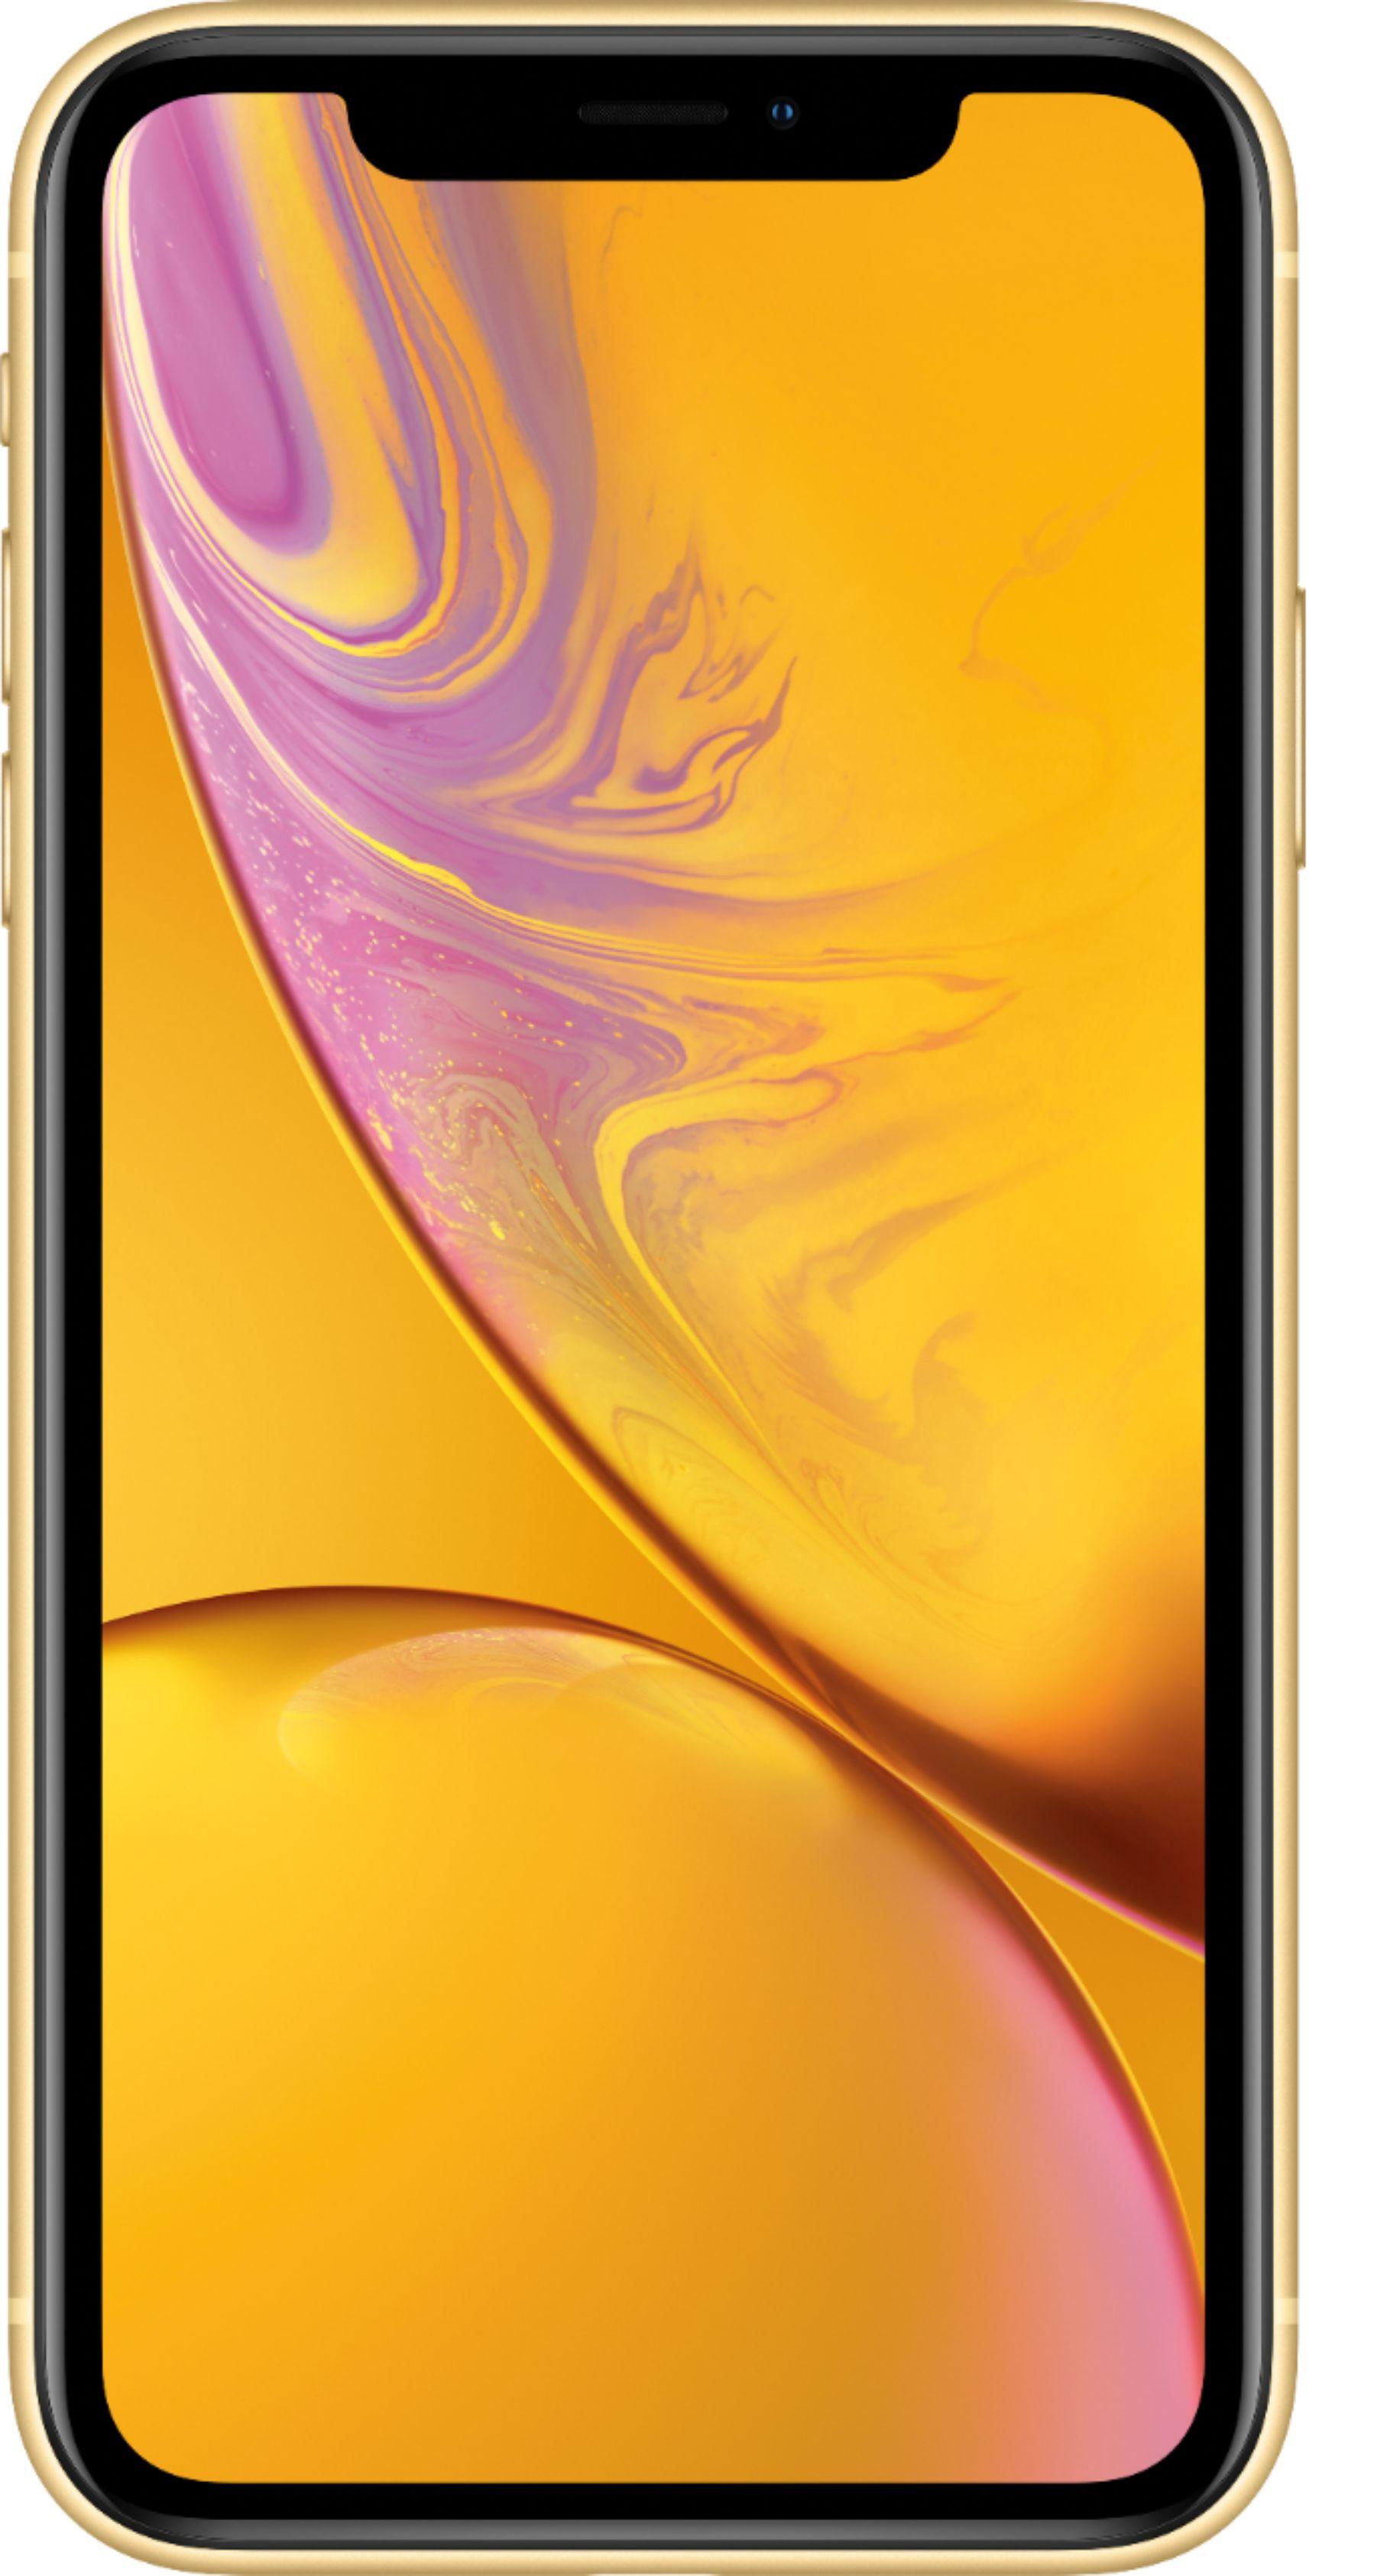 Iphone Xr Wallpaper 4k Yellow